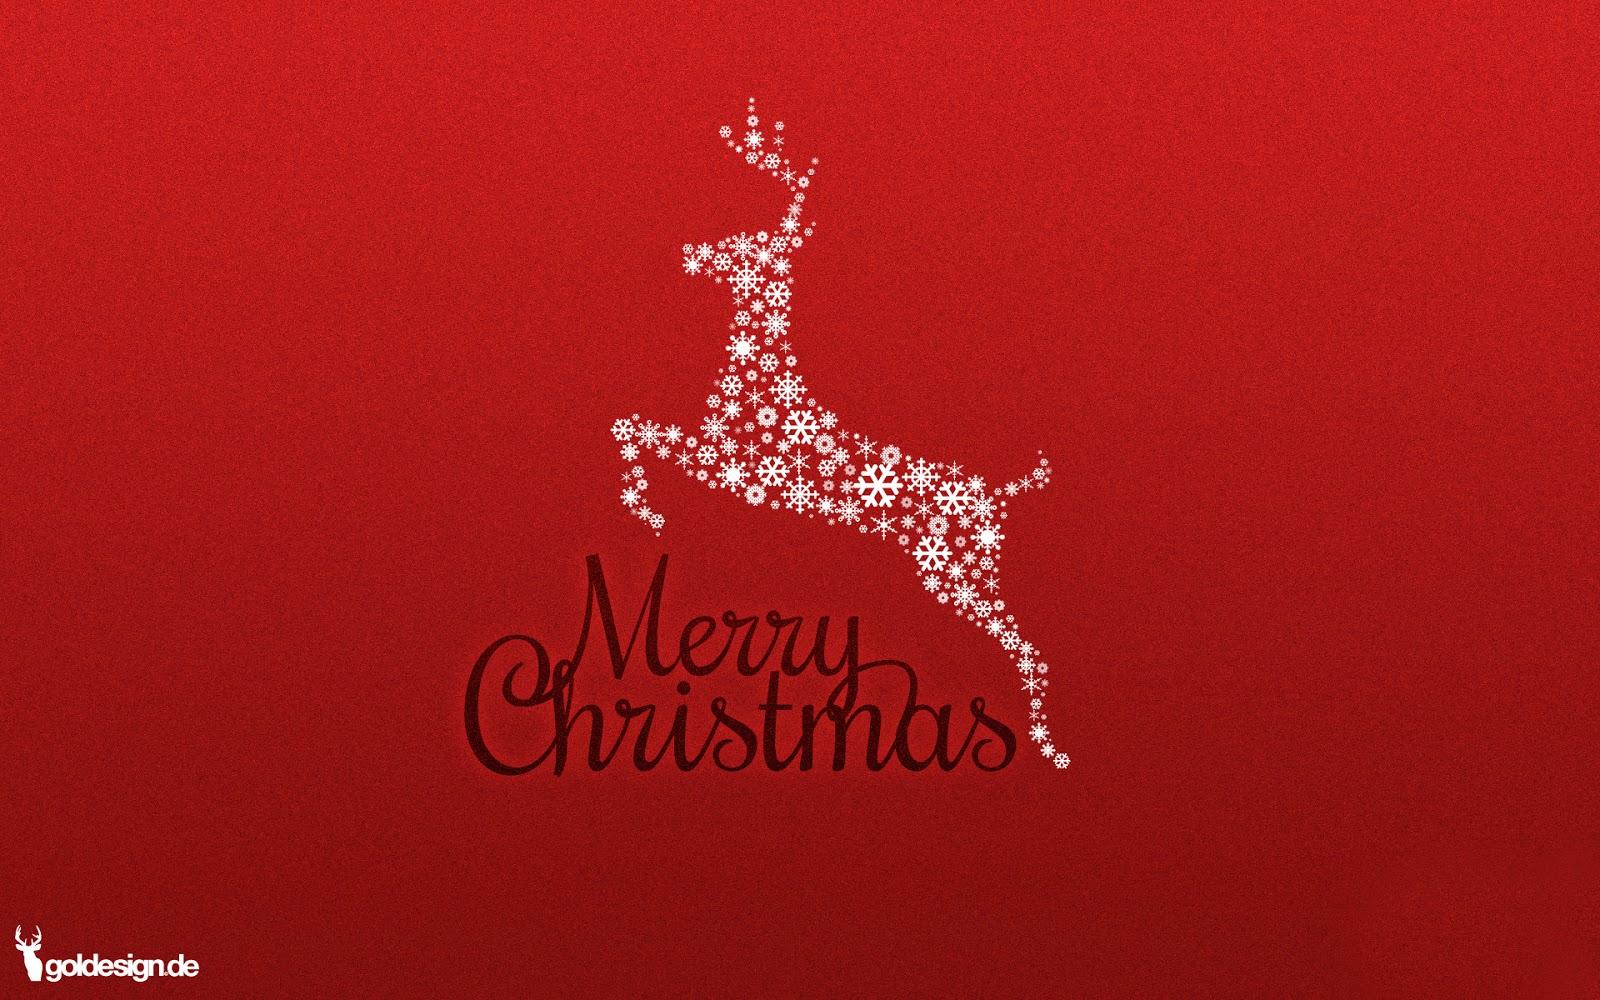 http://2.bp.blogspot.com/-bfknkpLpR5c/UNiHsKeFuBI/AAAAAAAAJUQ/0ECZ6m2bMBk/s1600/Merry+Cristmas+greeting+(20).jpg